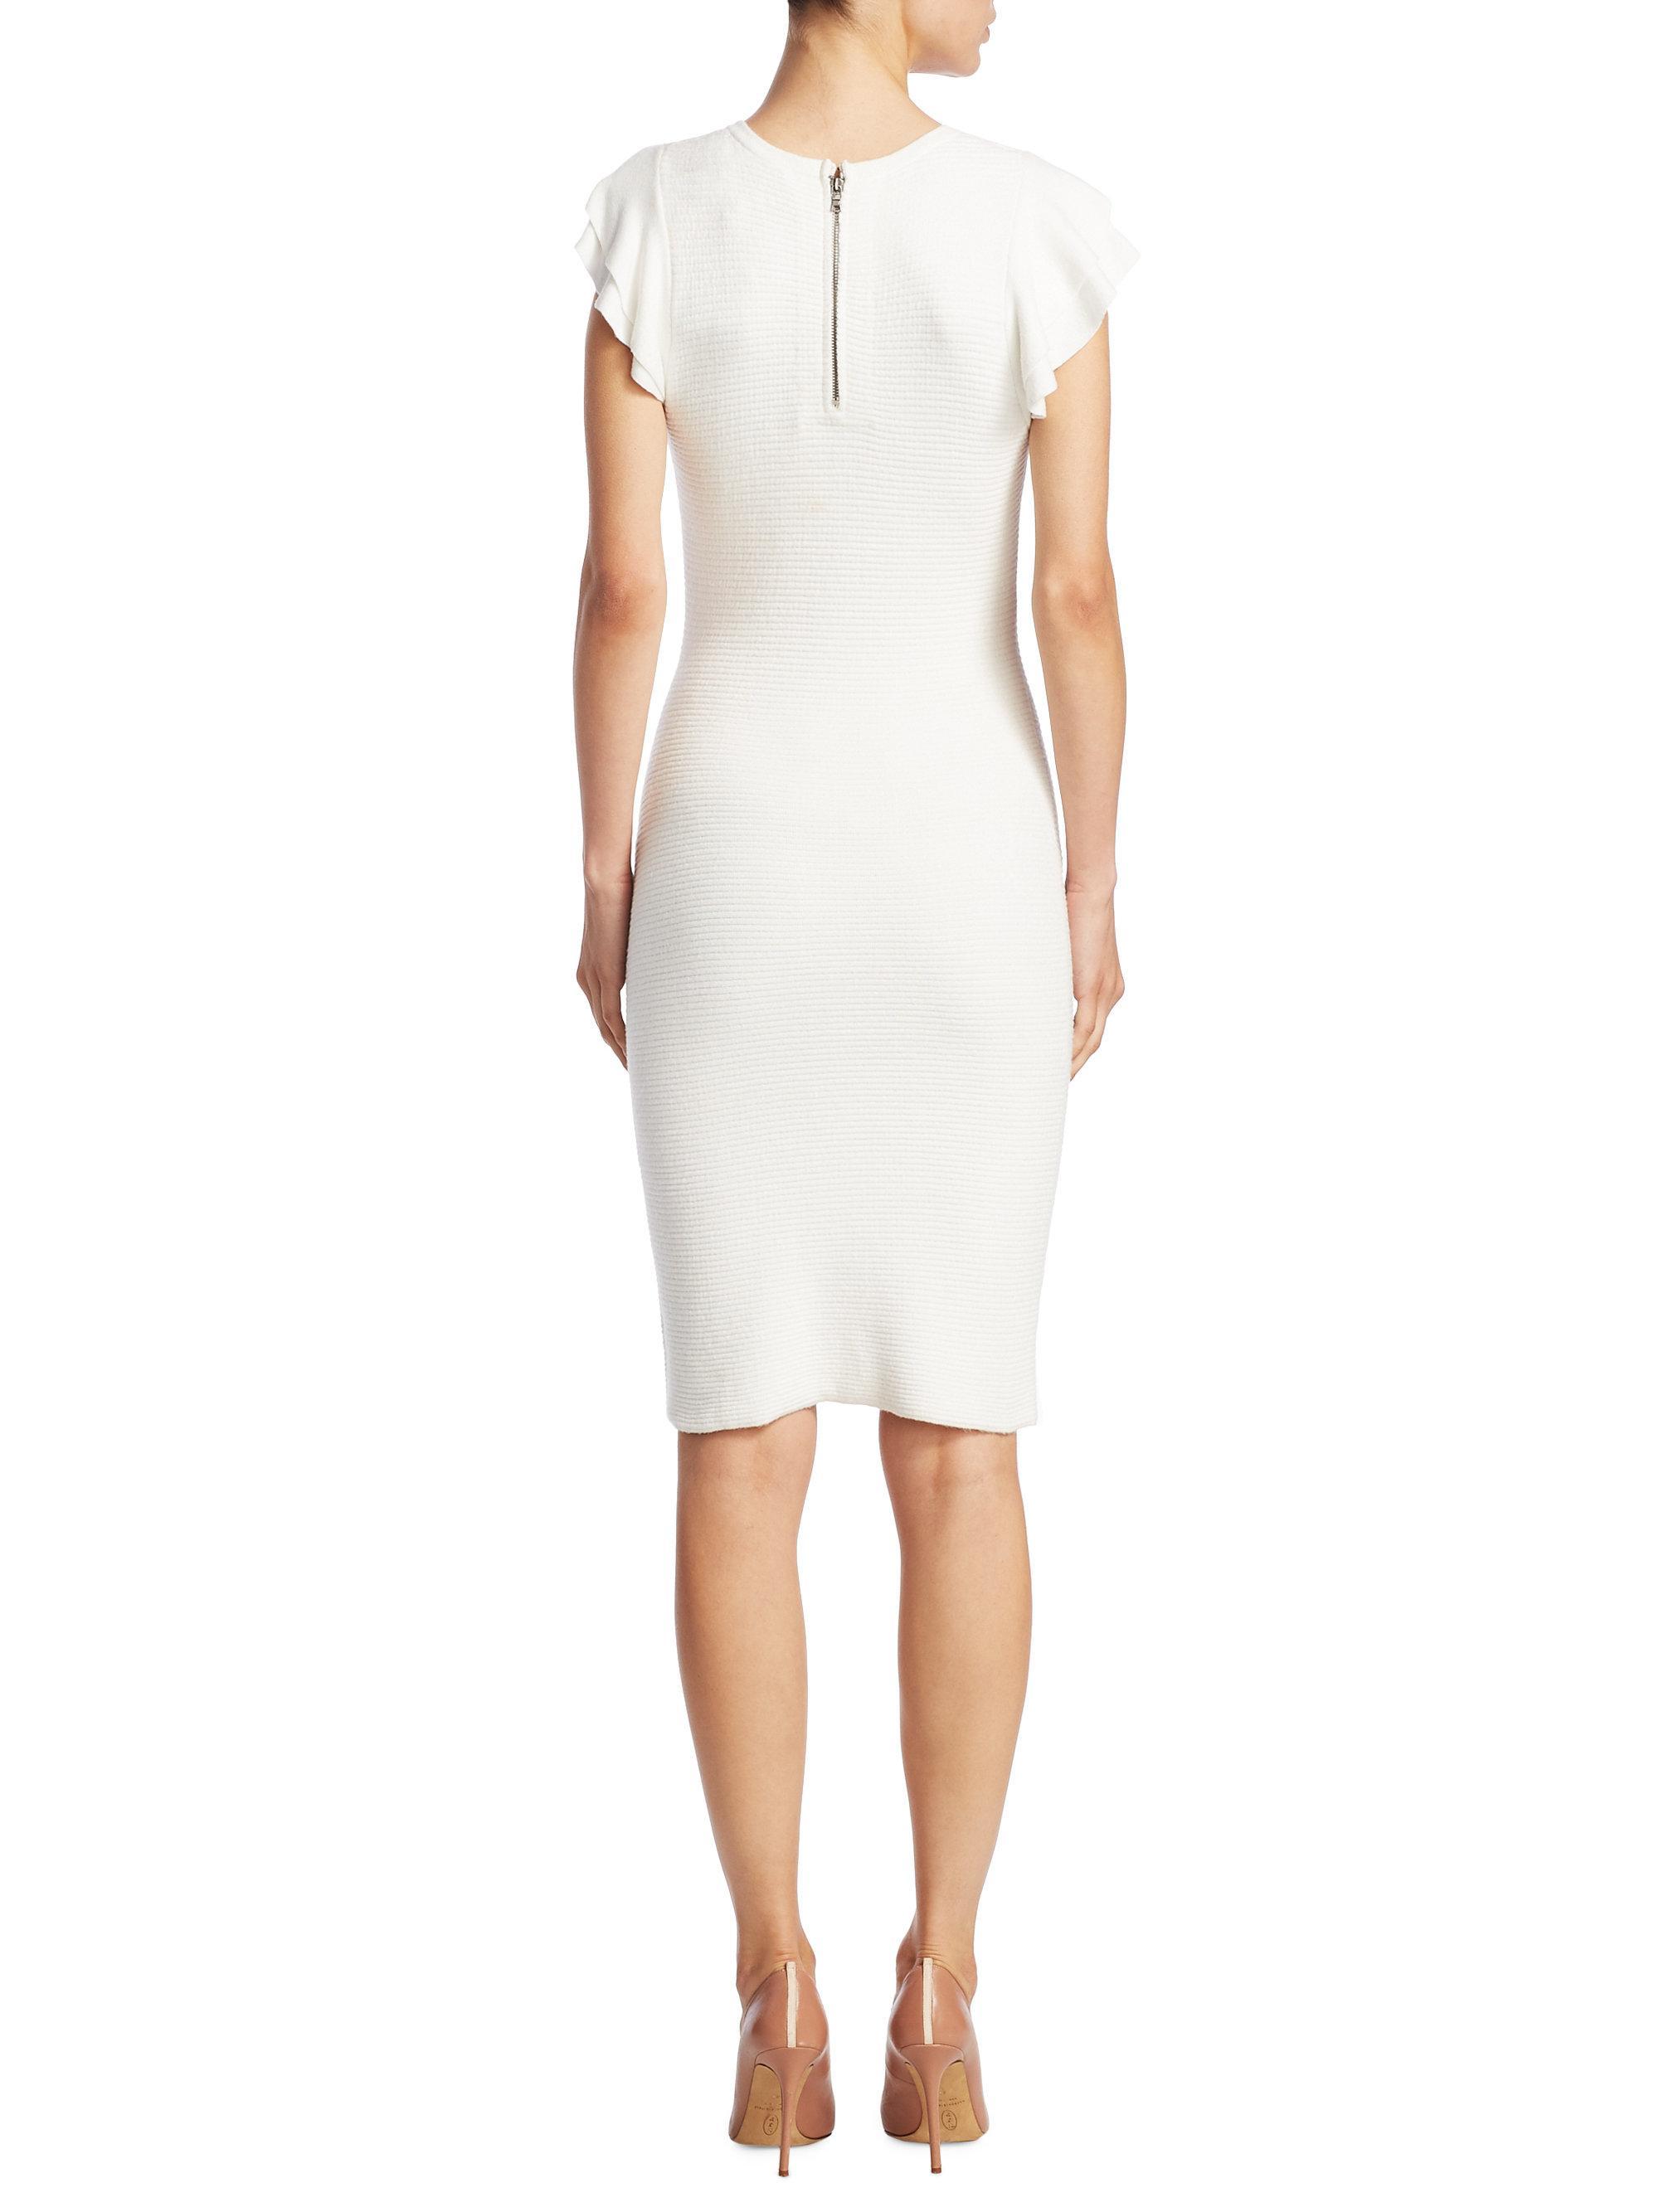 9ad2fd63a6 Lyst - Alice + Olivia Kellin Ruffle Sleeve Sheath Dress in White